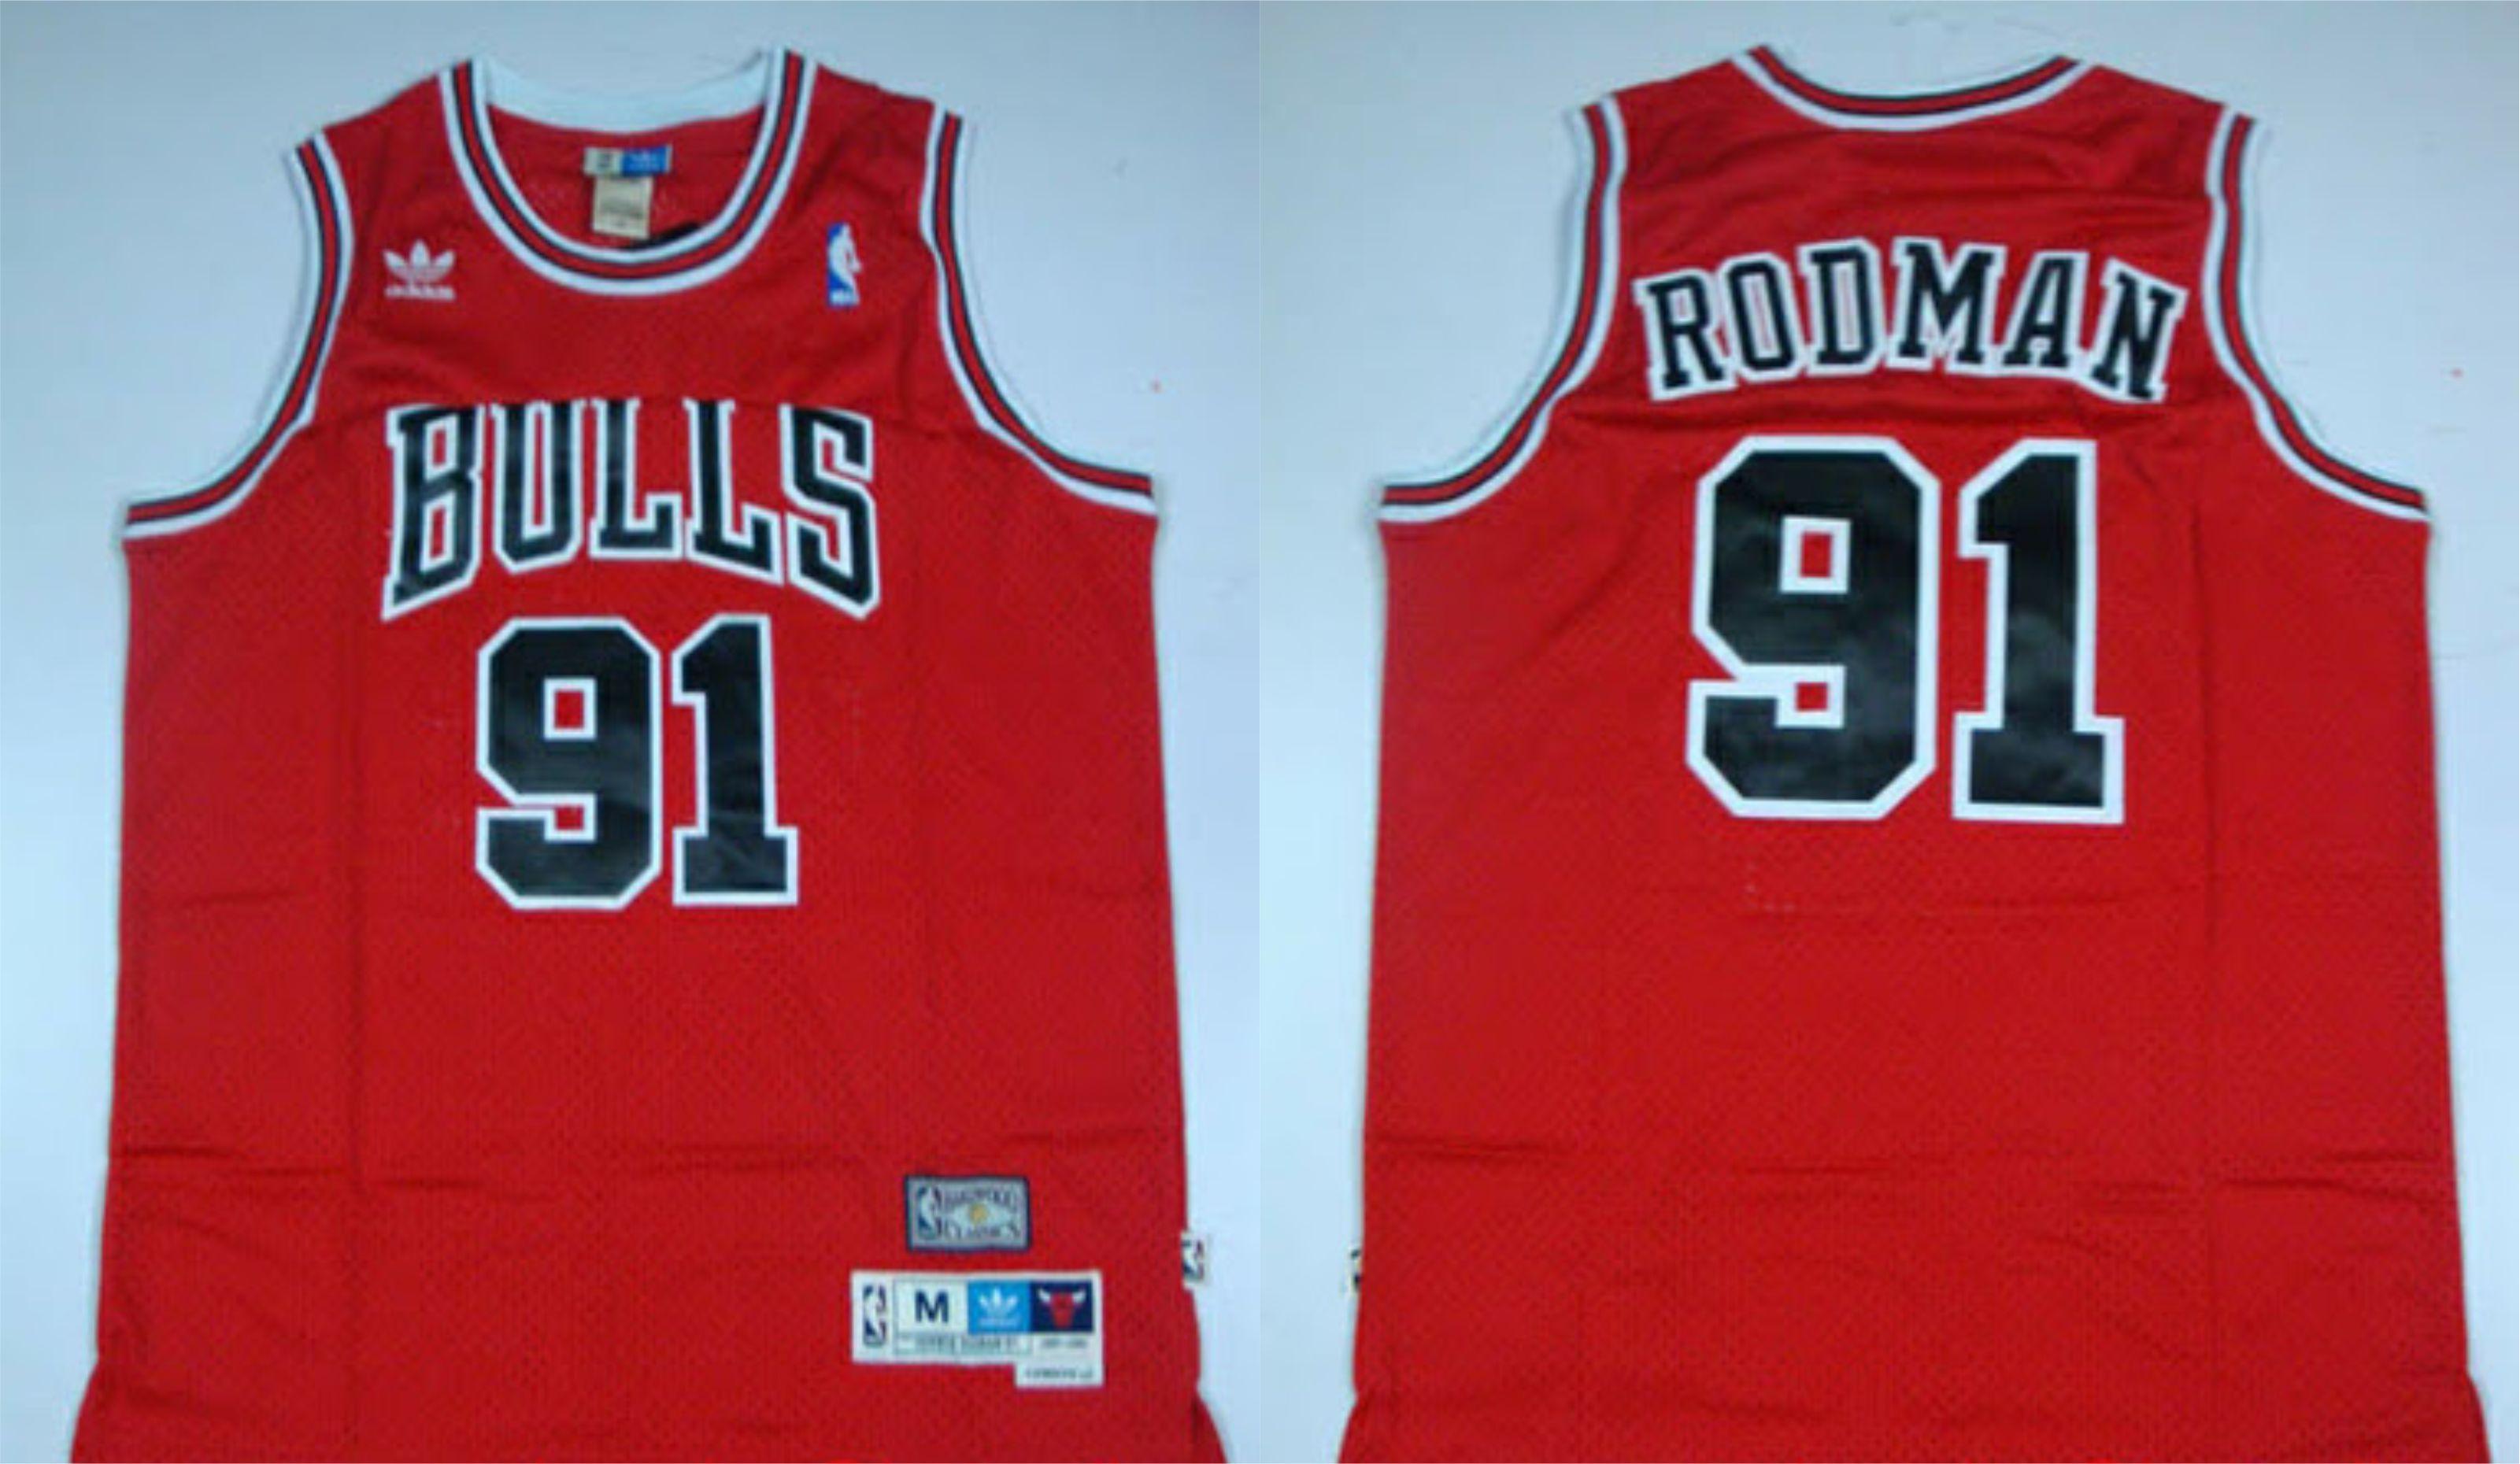 ... Swingman Jersey Dennis Rodman NBA Retro Pinterest Dennis rodman and ... d7fe7ff32